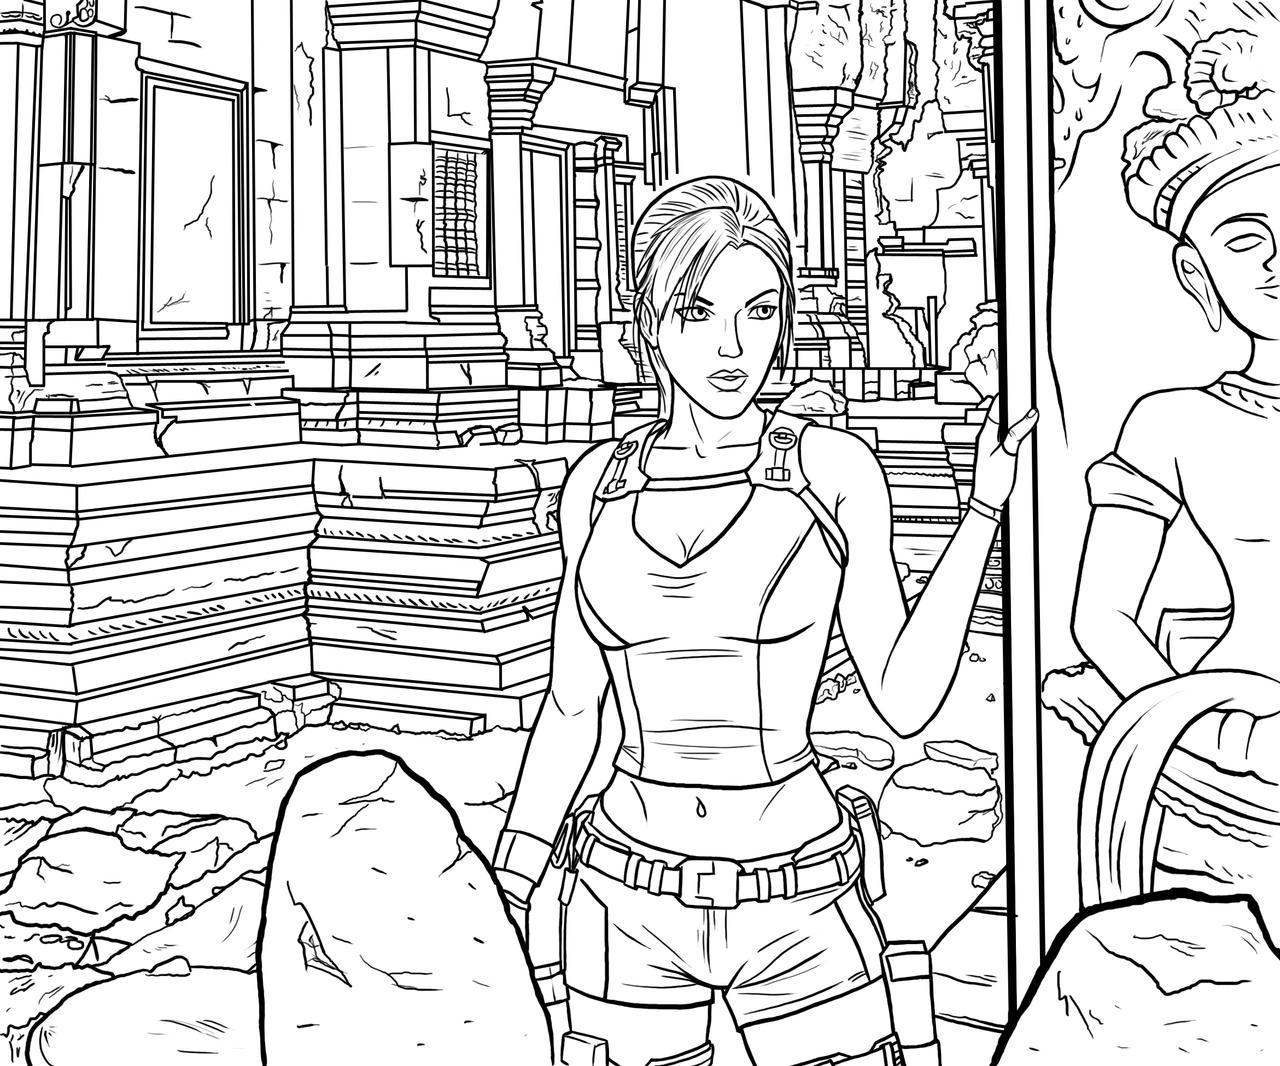 tomb raider angkor lineart by bksmith - Lara Croft Coloring Pages